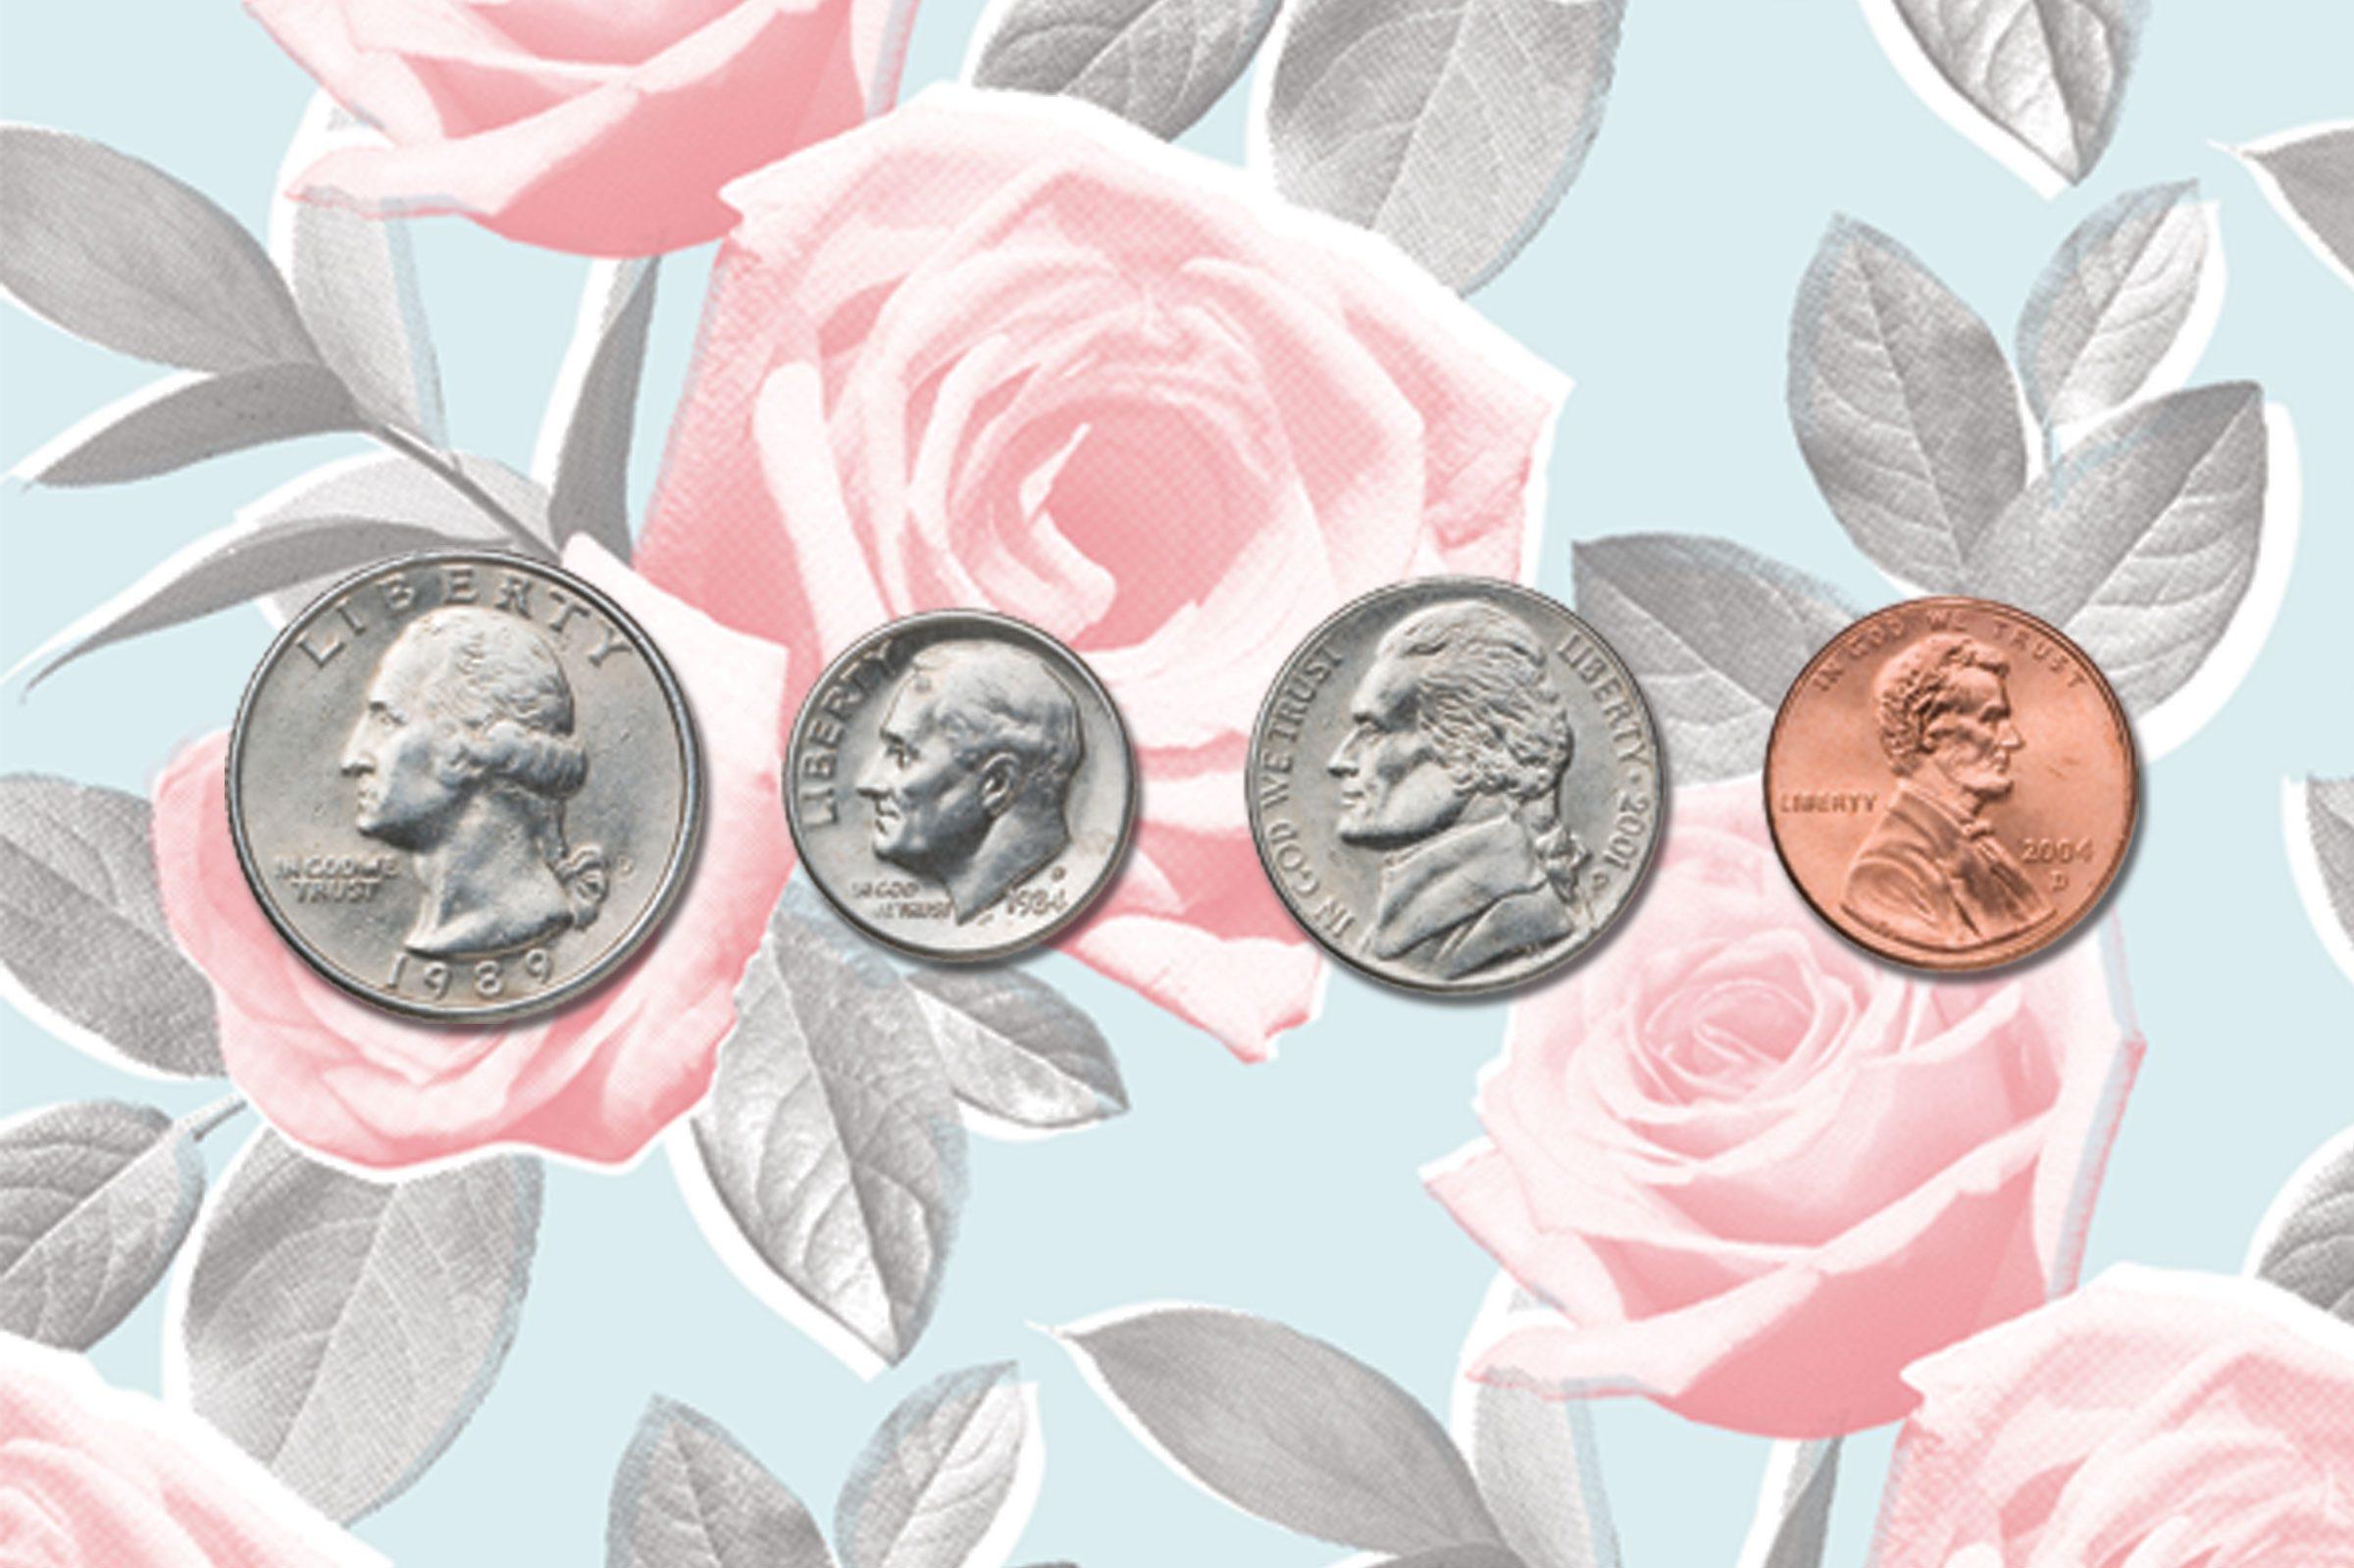 How To Make Flowers Last Longer 8 Pro Tricks Reader S Digest